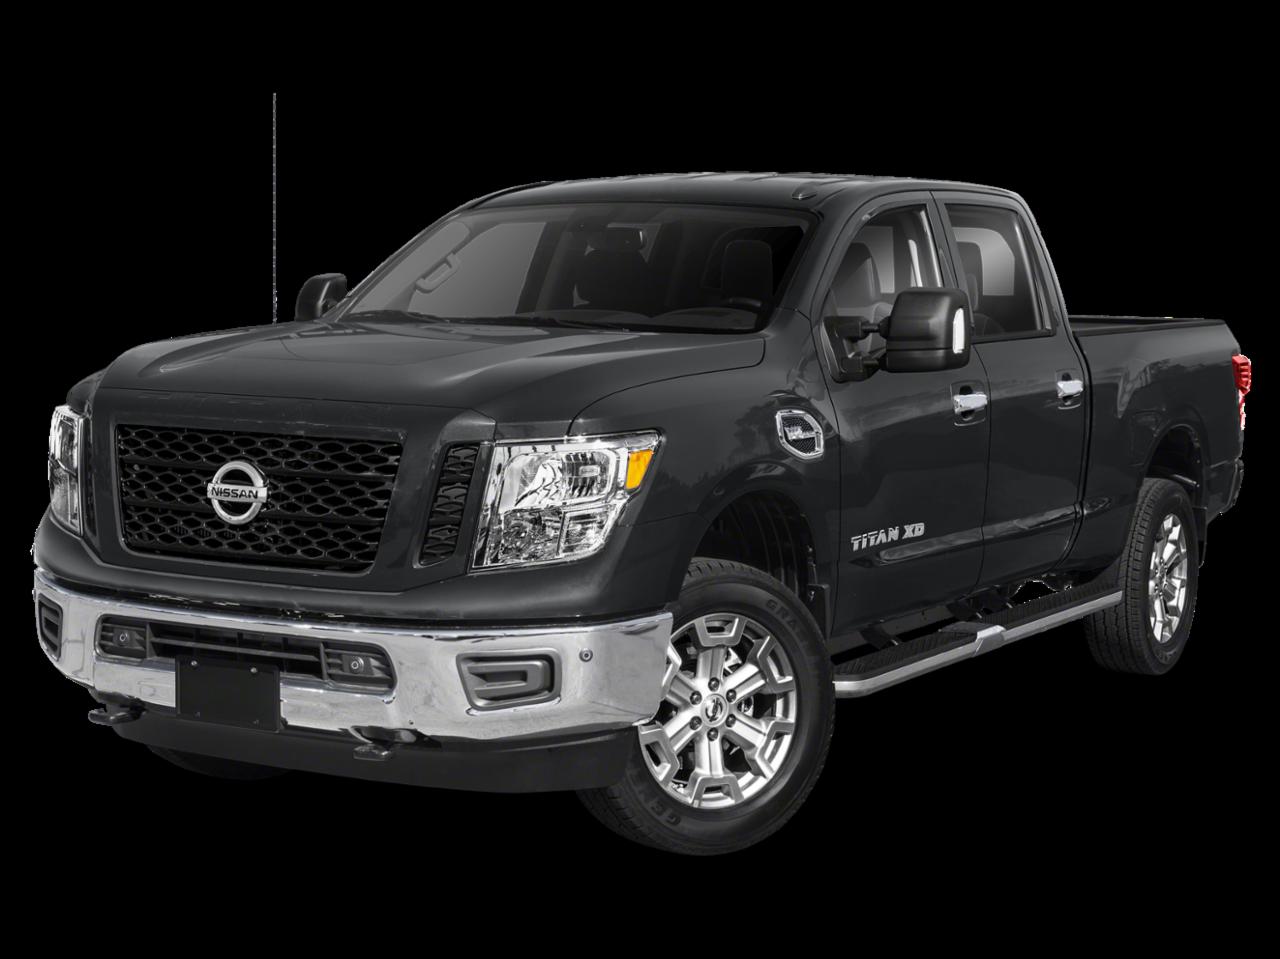 "2019 Nissan<br/><span class=""vdp-trim"">Titan XD SV 4WD Crew Cab Pickup</span>"